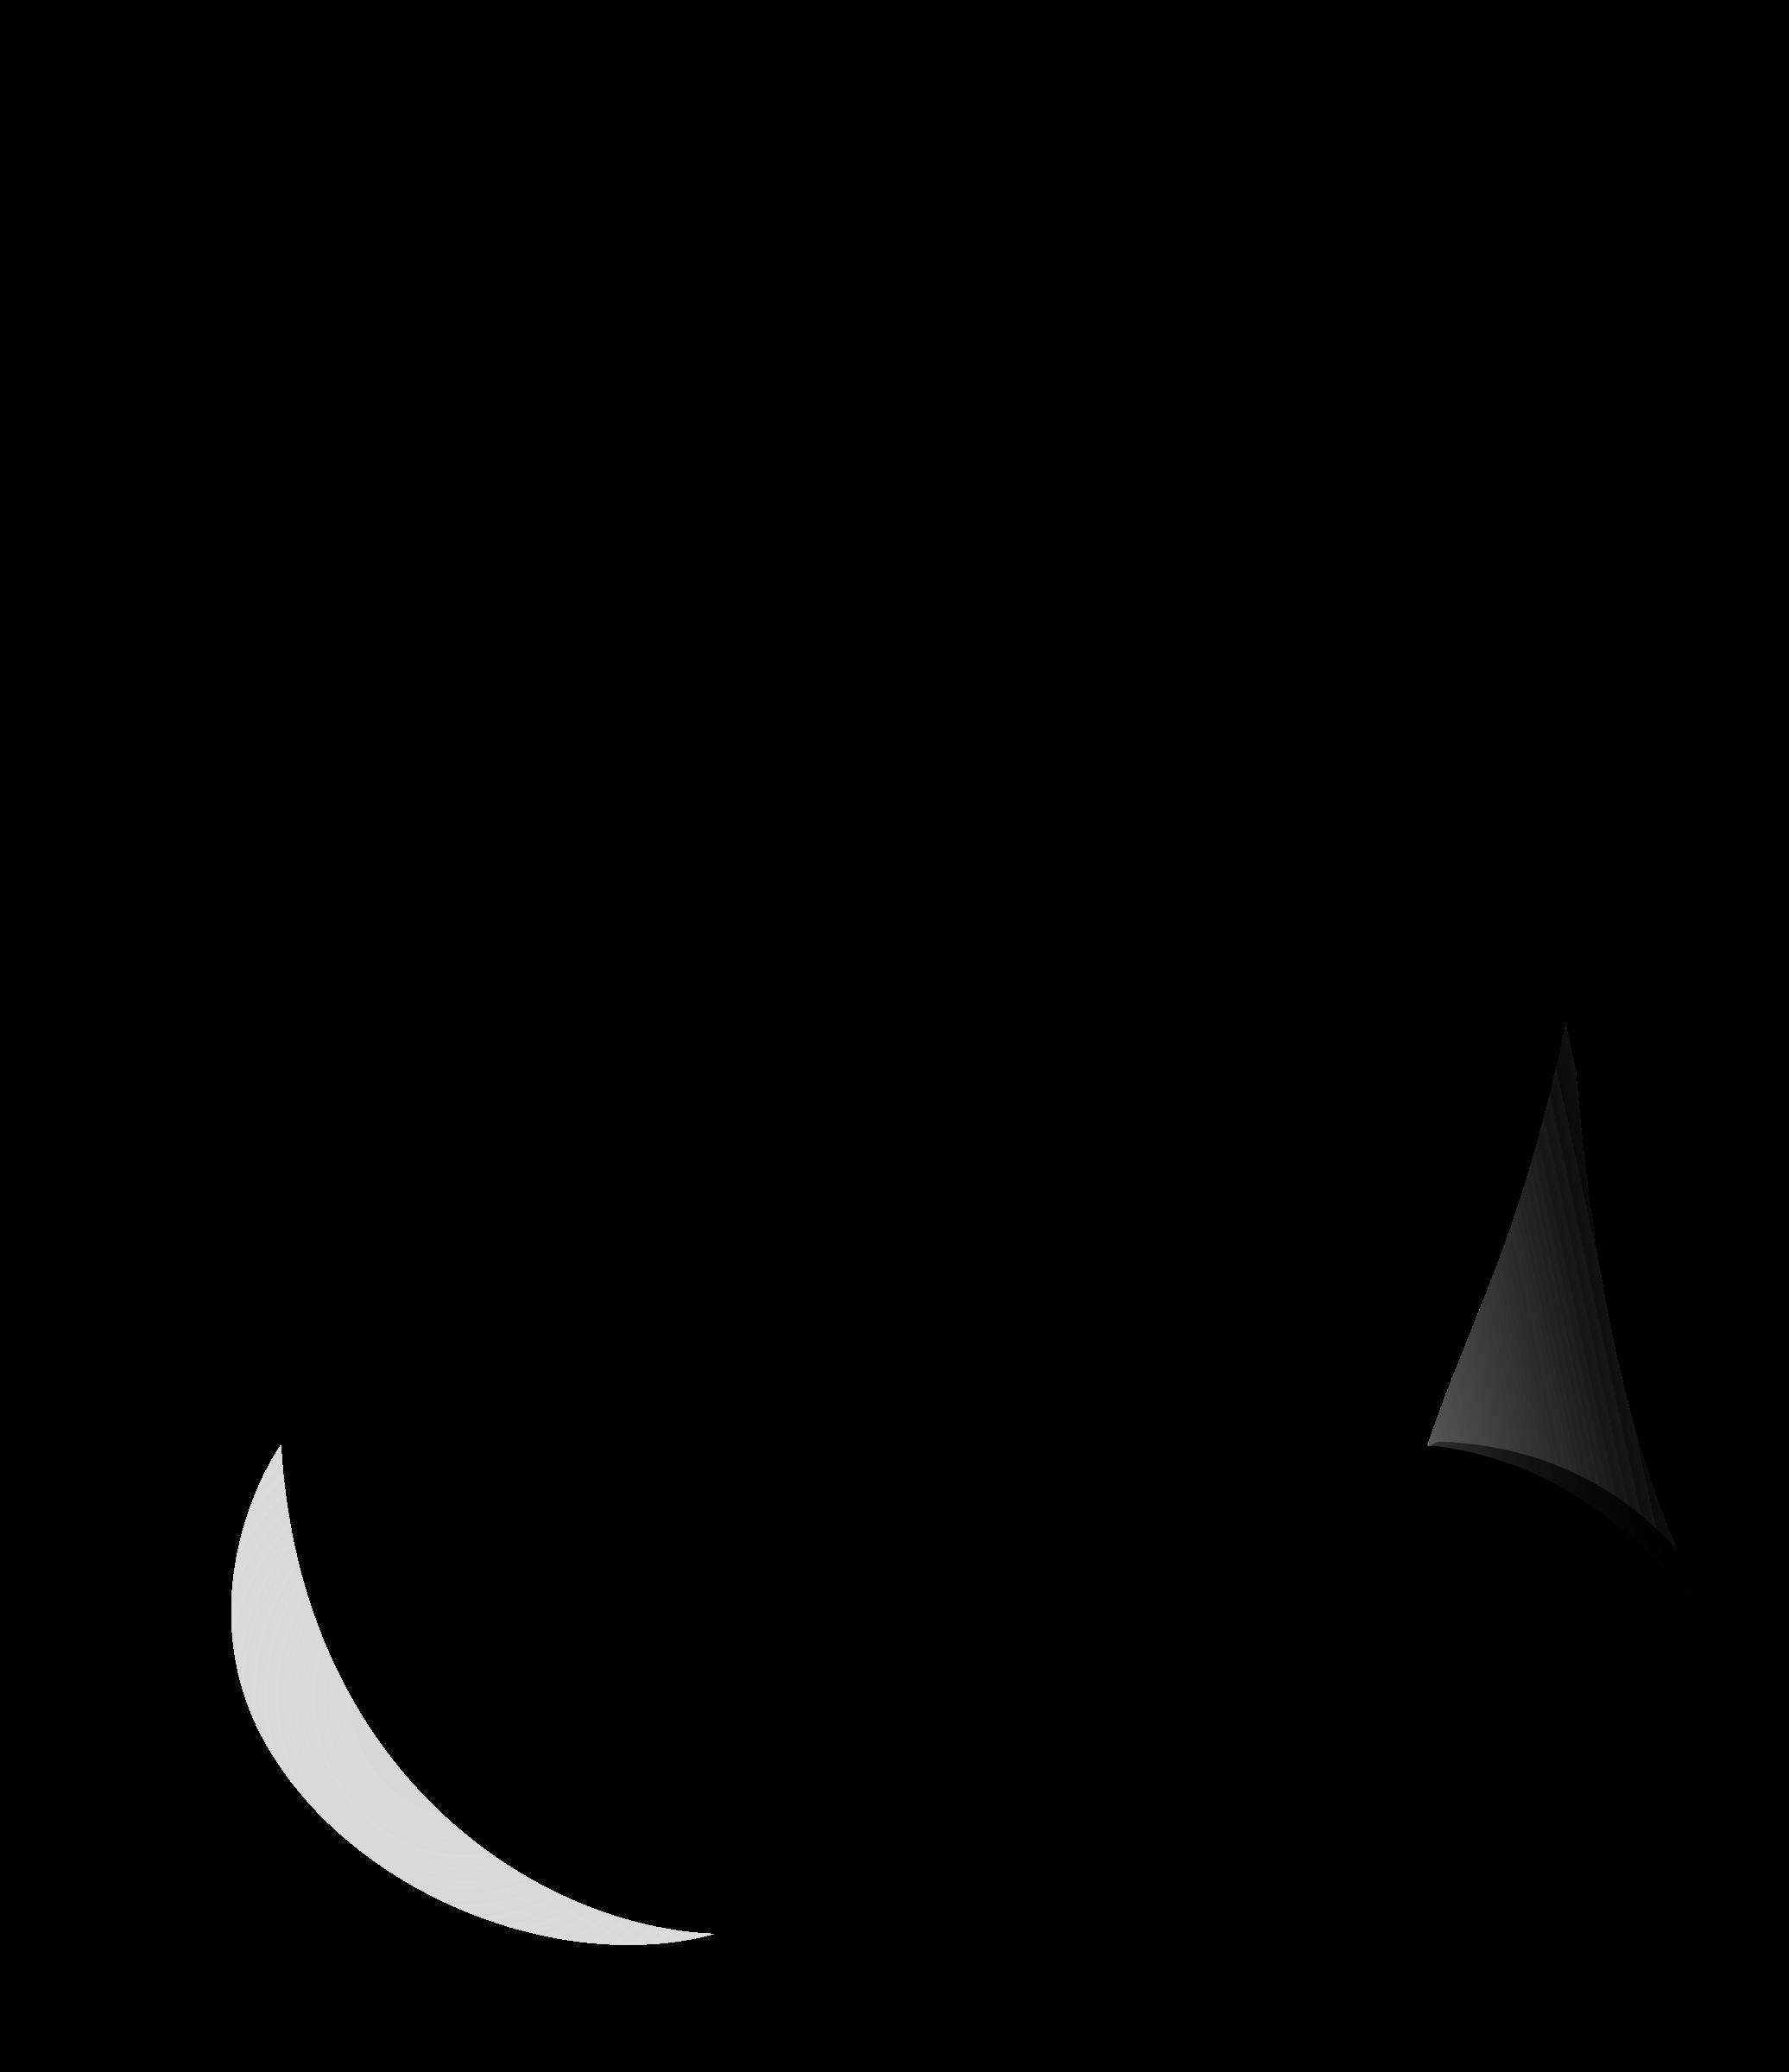 Nose Clipart-nose clipart-15